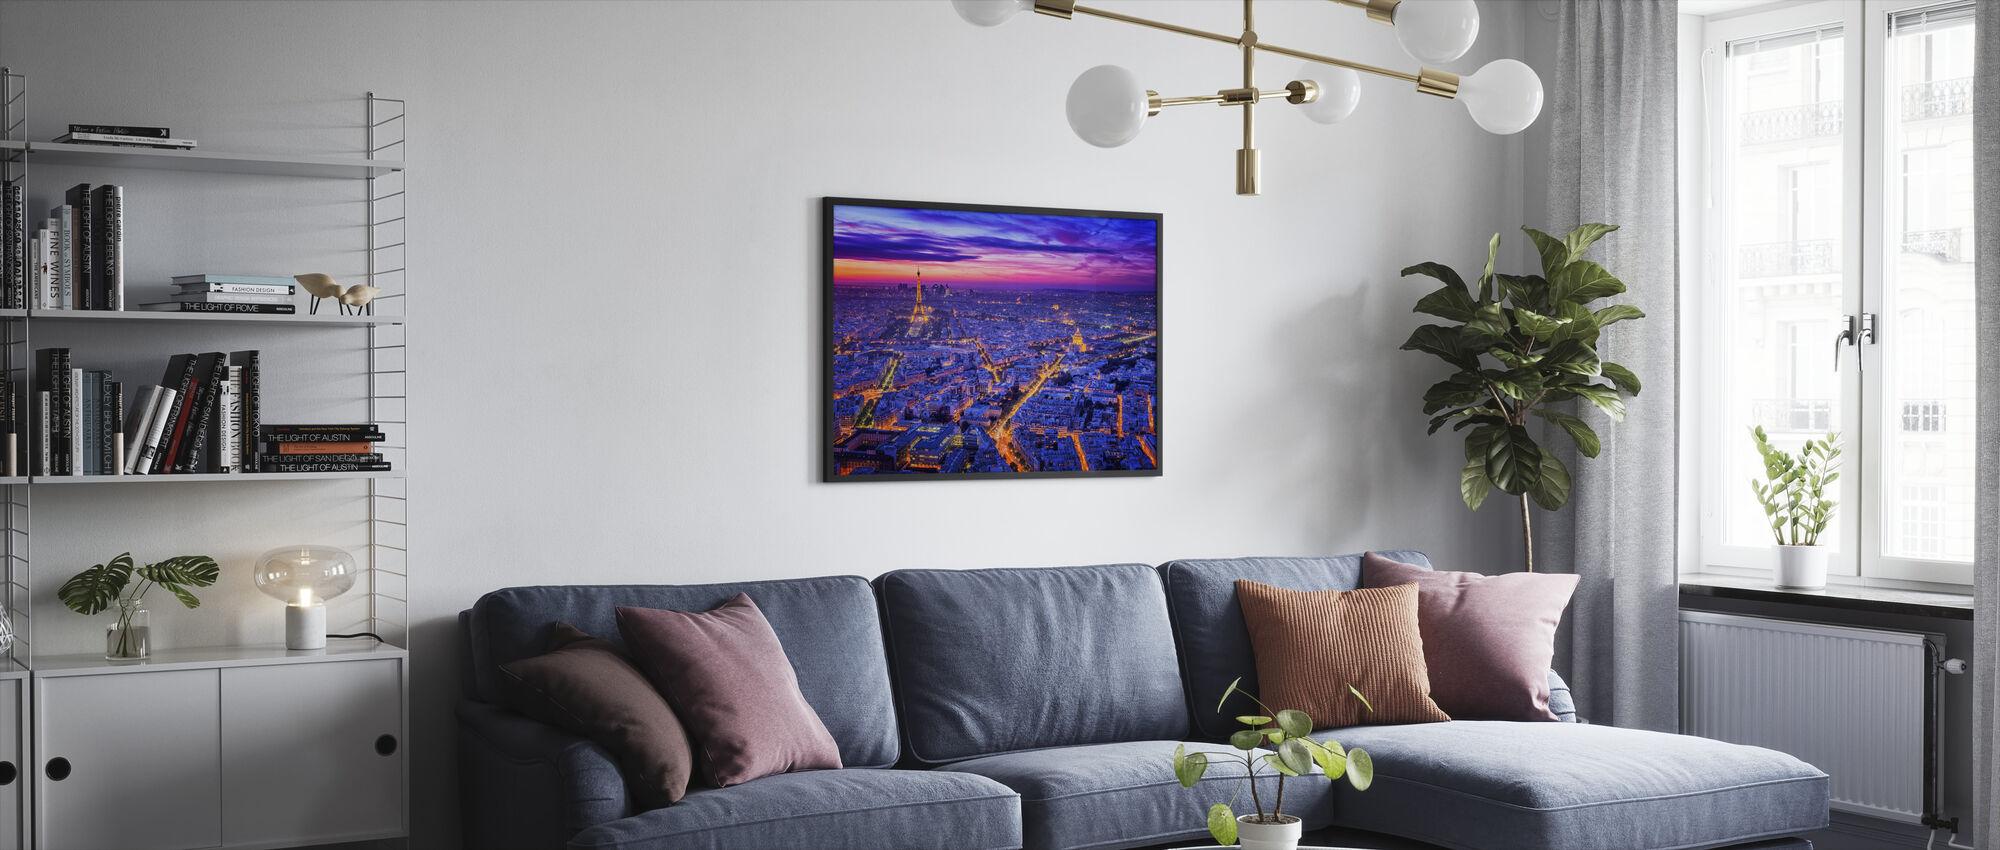 Paris By Night - Framed print - Living Room